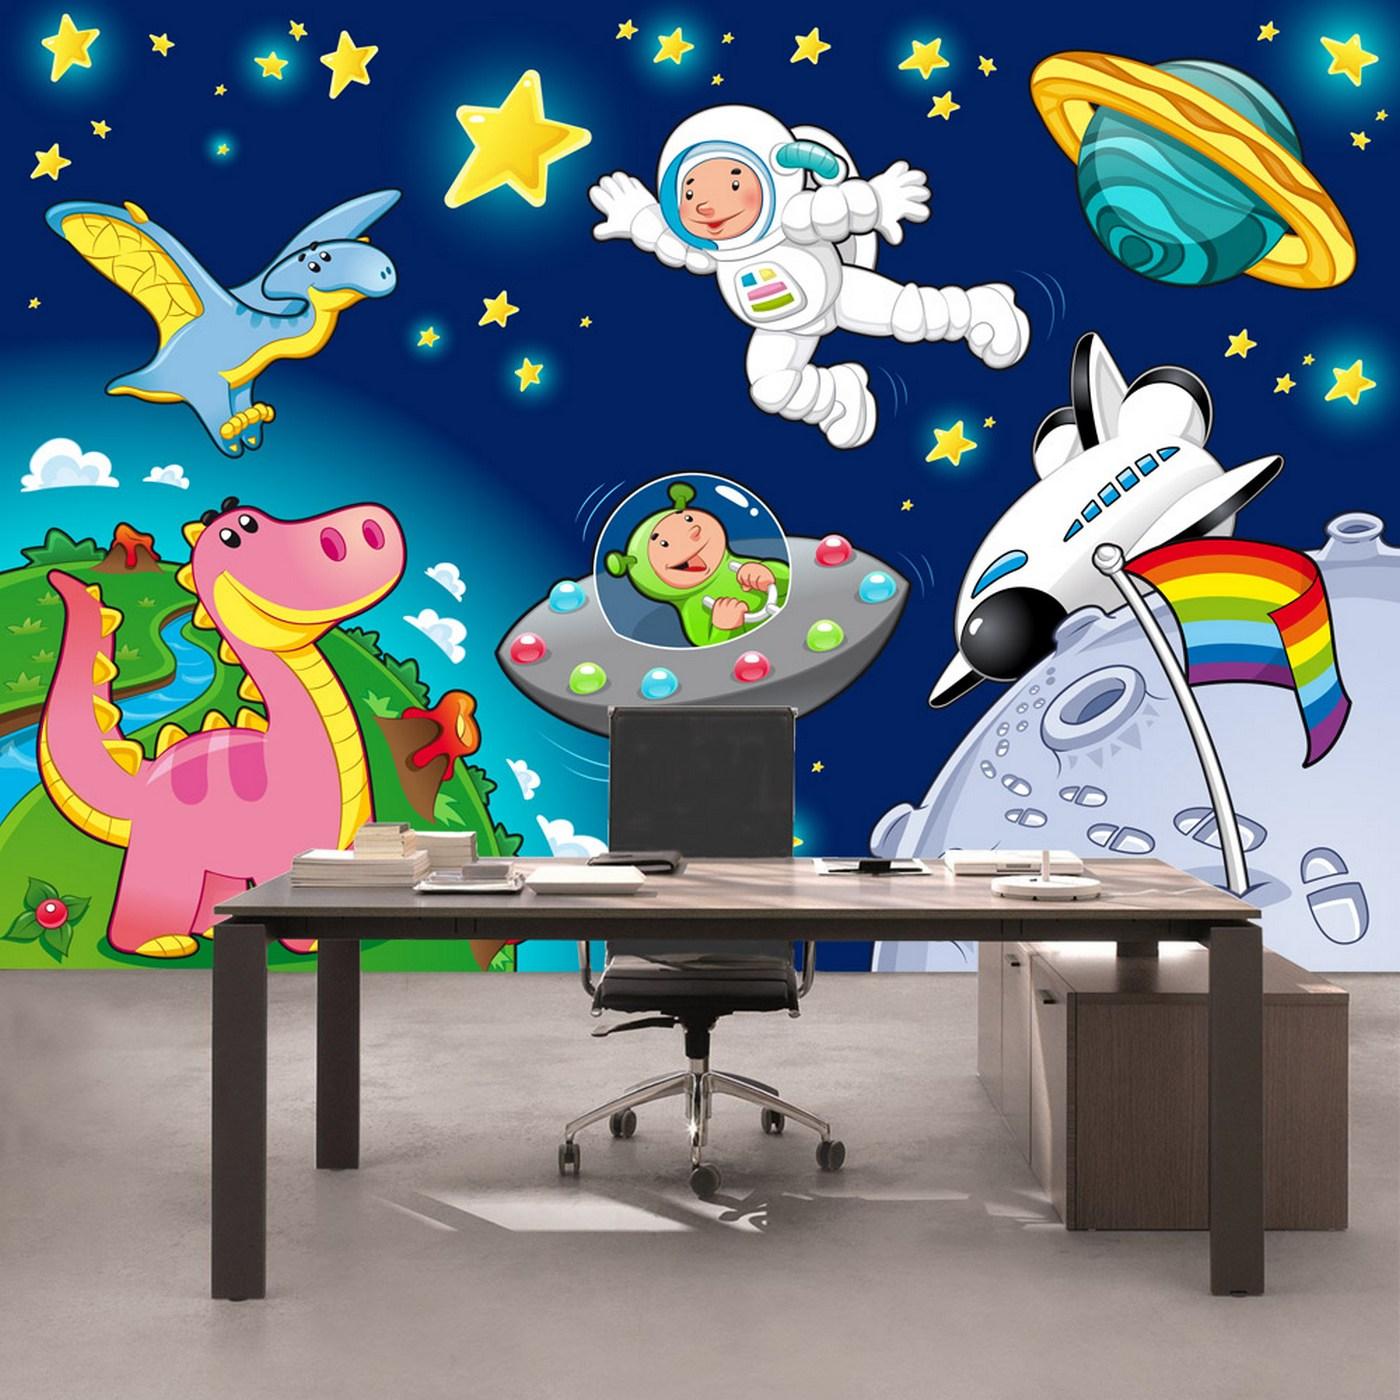 Vlies Fototapete 89 - Little Space Explorers Kindertapete Tapete  Kinderzimmer Weltraum Star All Weltall Mond Sterne blau